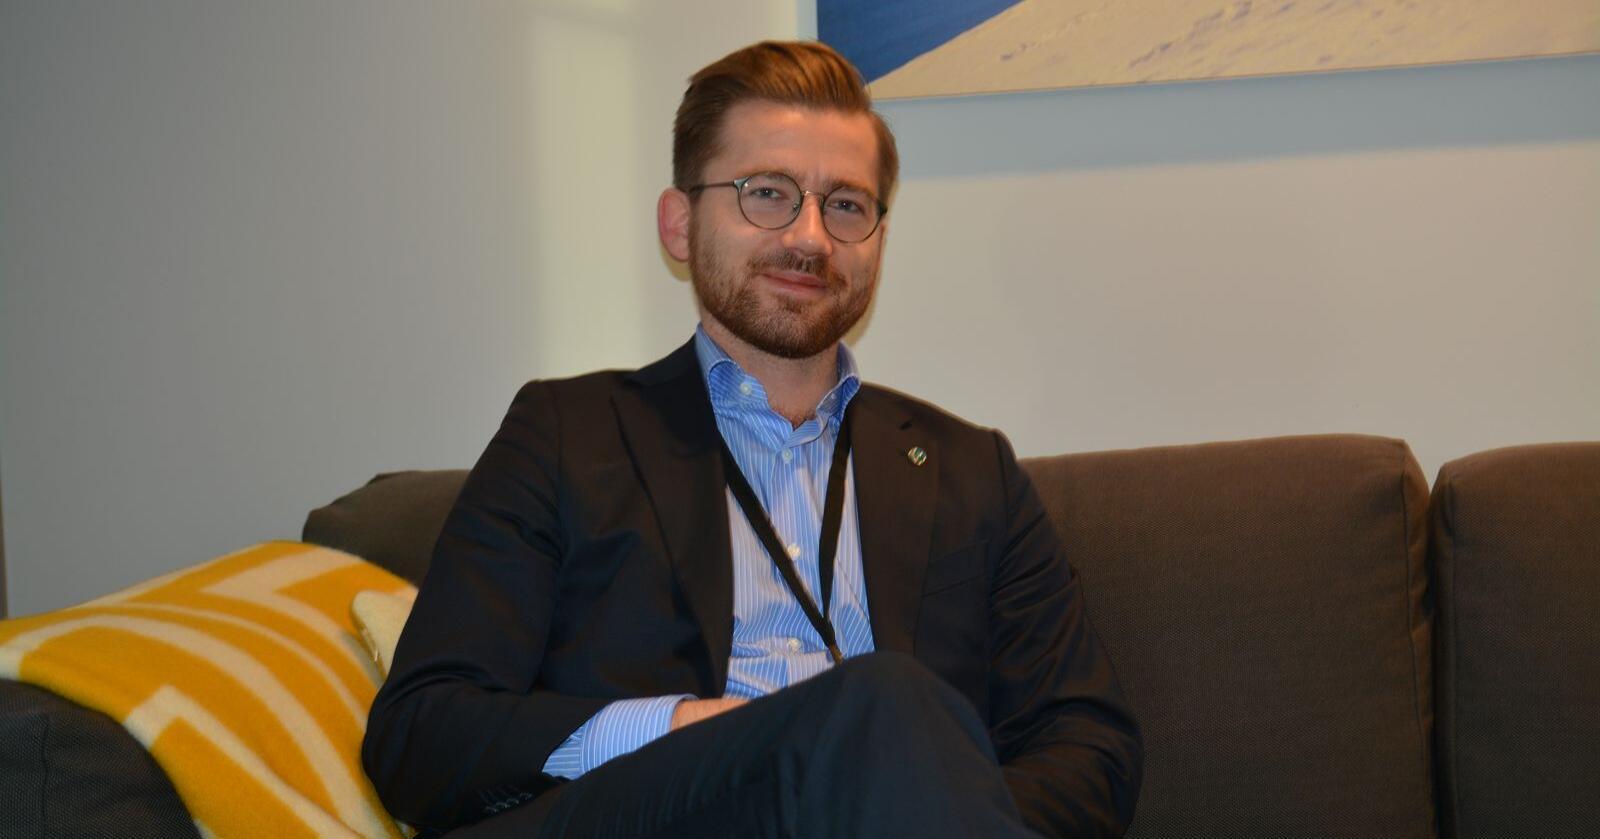 Det er ein tendens til å gje rovdyra skulda for alle problema i sauenæringa, meiner klima- og miljøminister Sveinung Rotevatn. (Foto: Anders Sandbu)